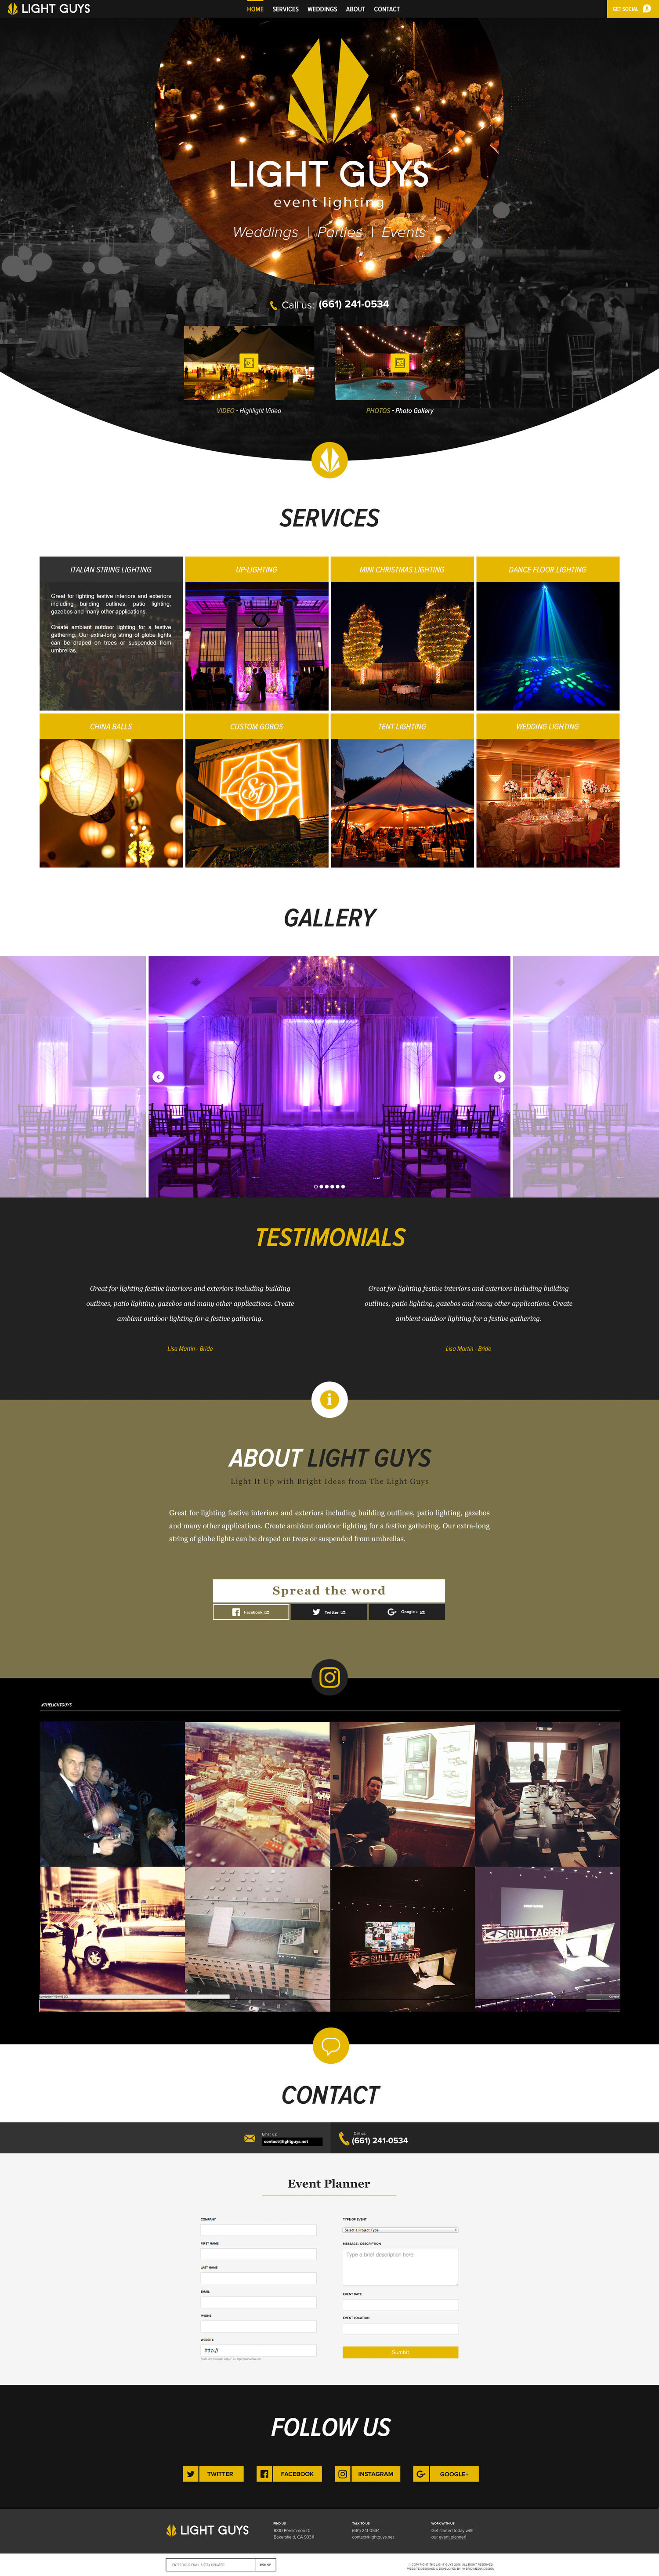 Web Design | Light Guys - Events Lighting (Desktop View)